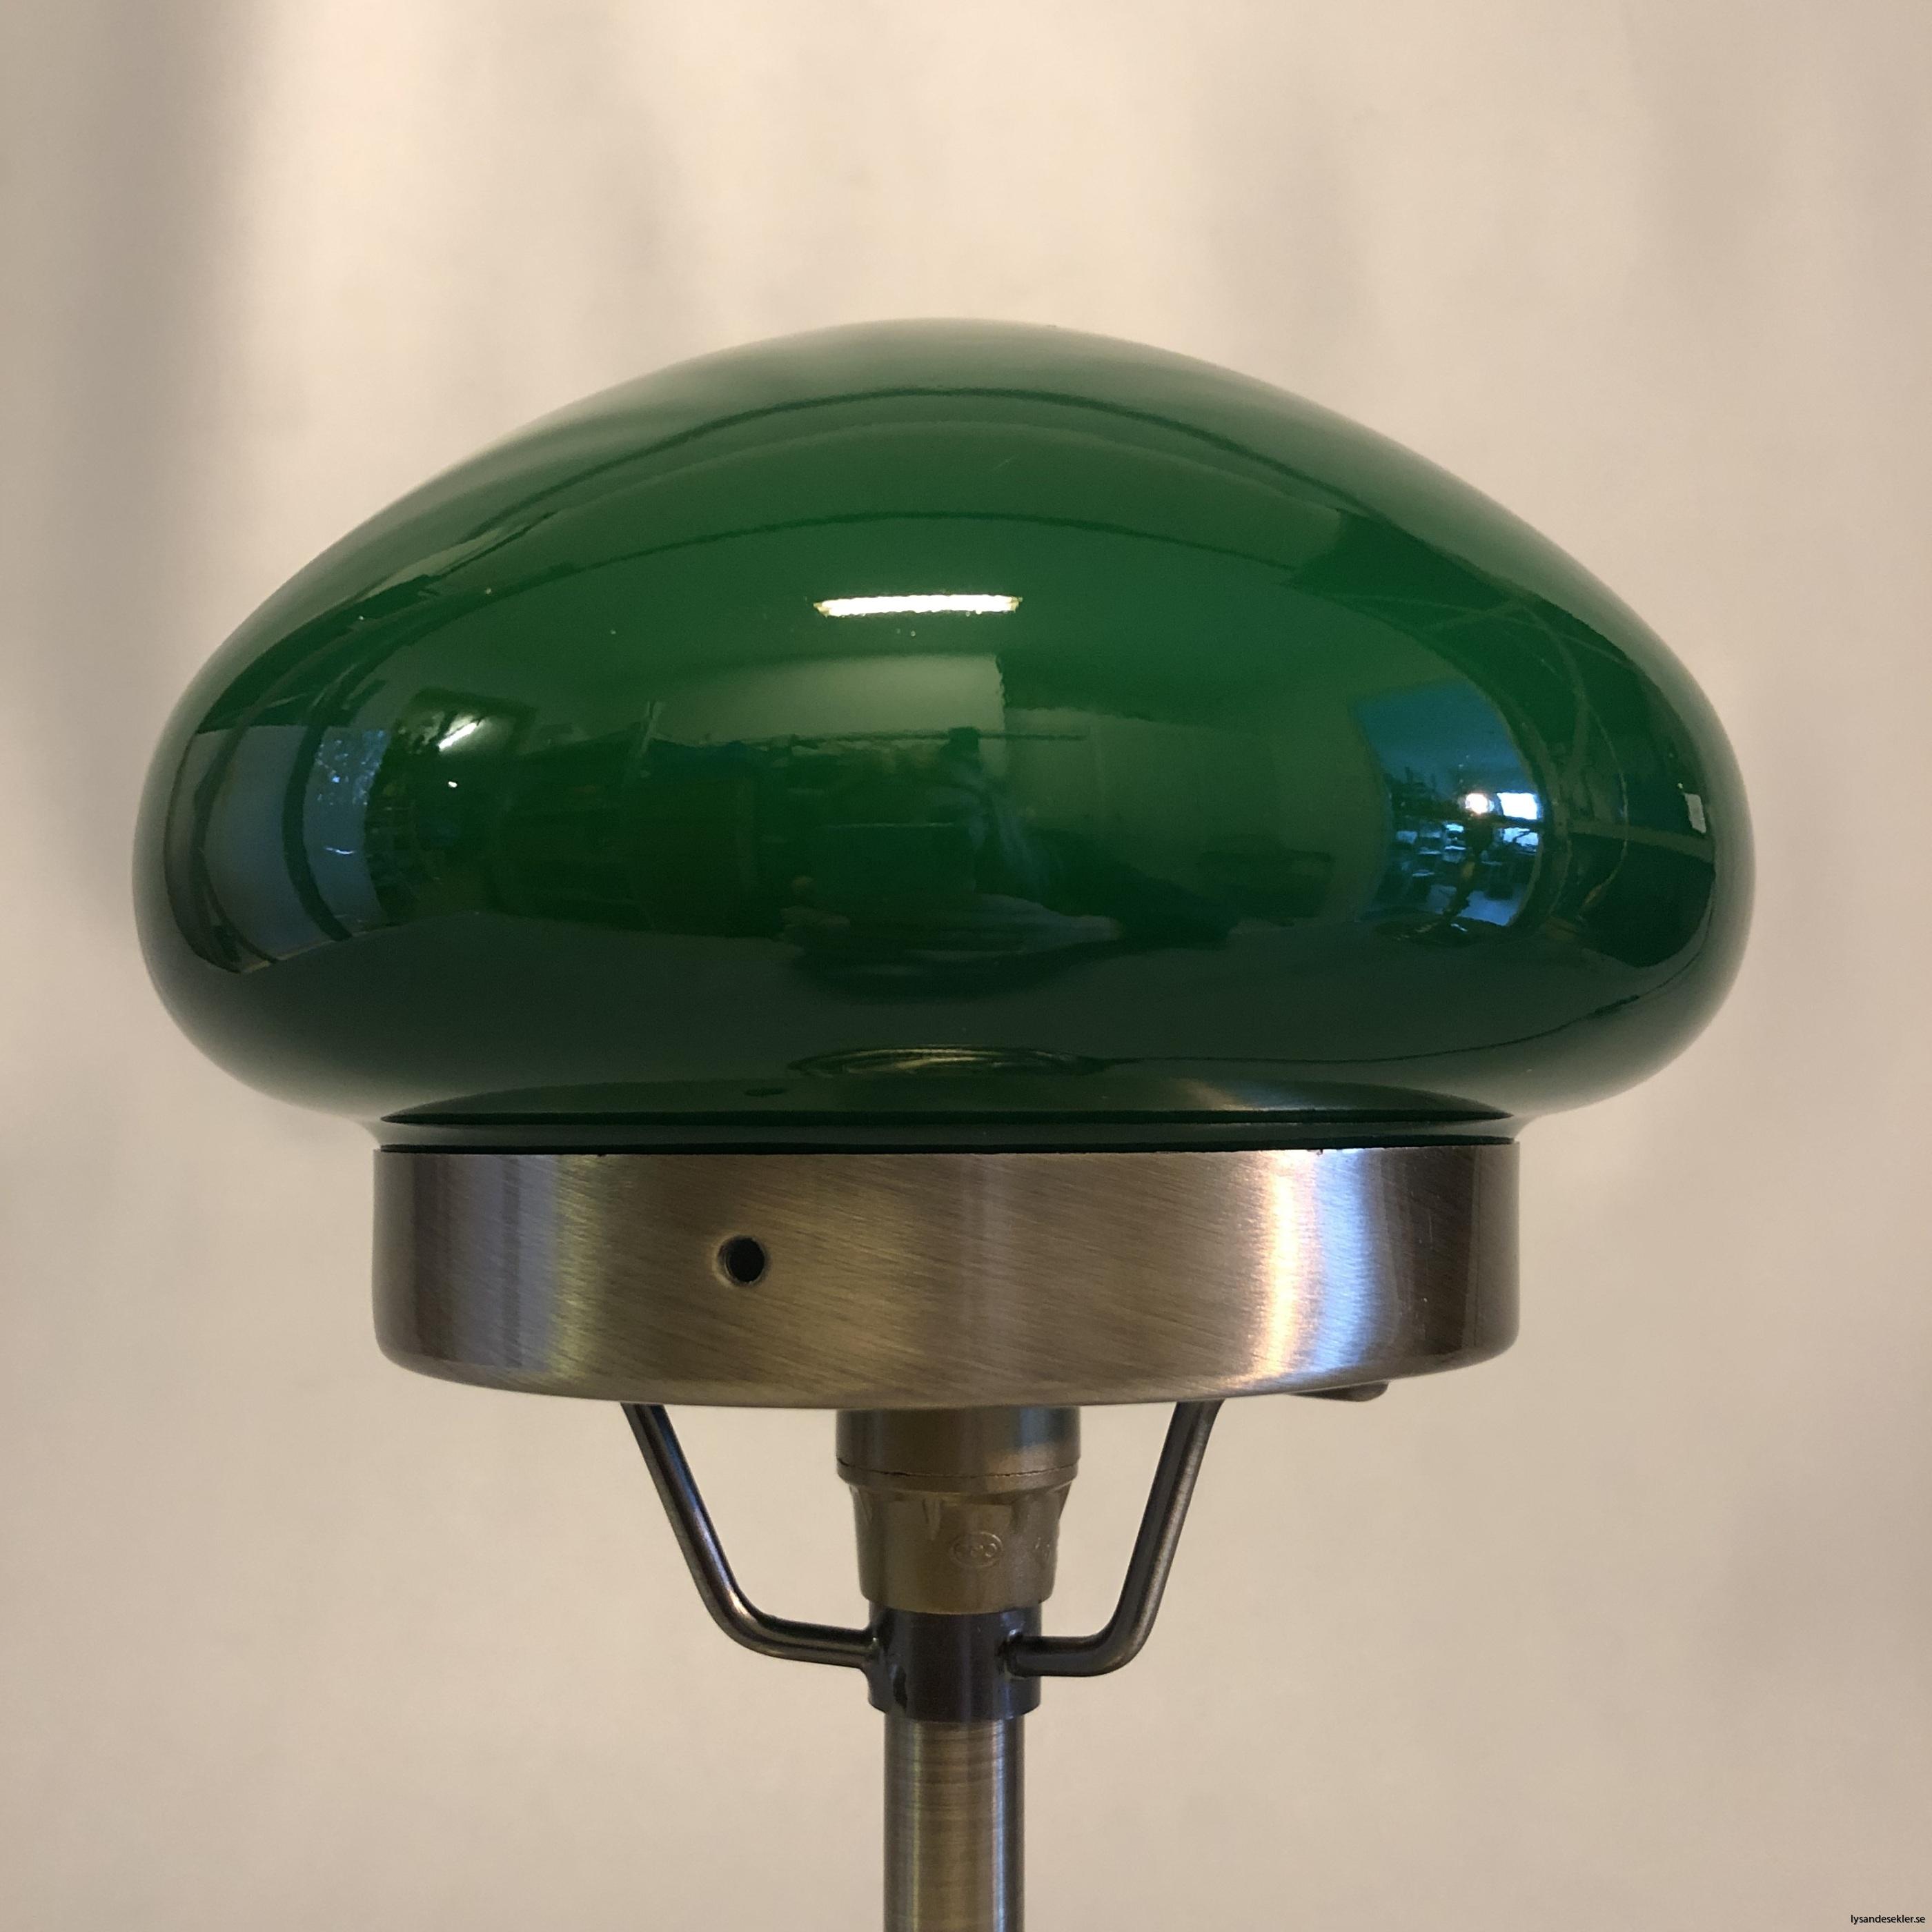 liten strindbergslampa 12 cm skärm27